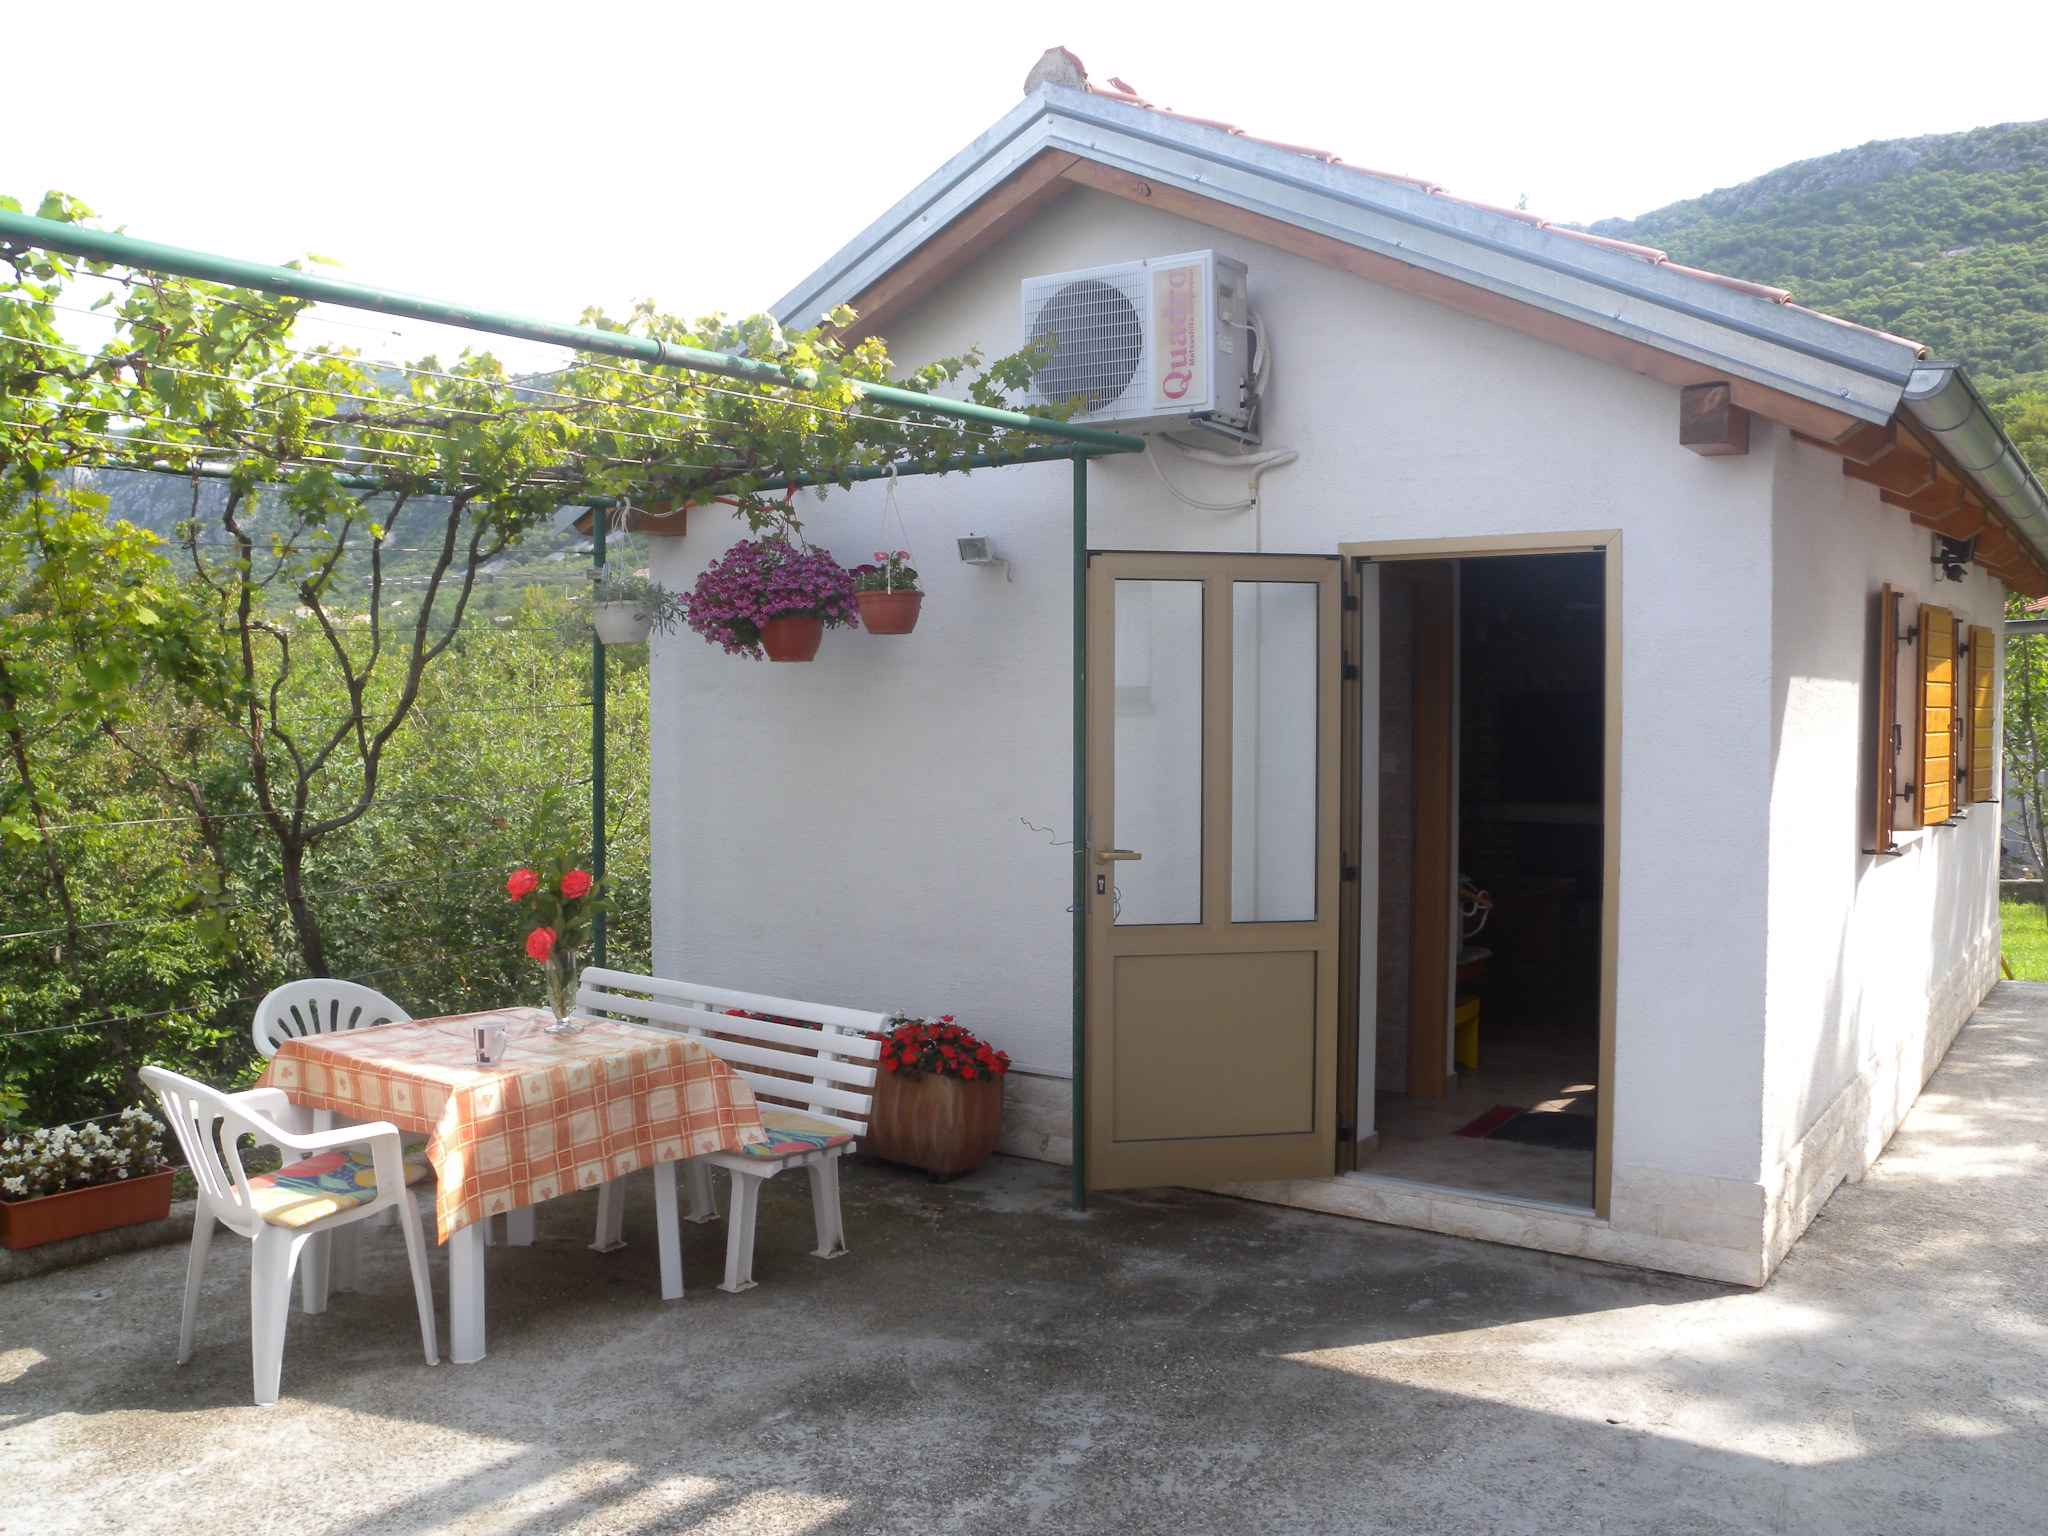 Appartement de vacances s ljetnom kuhinjom i bazenom (648047), Grižane, , Kvarner, Croatie, image 10